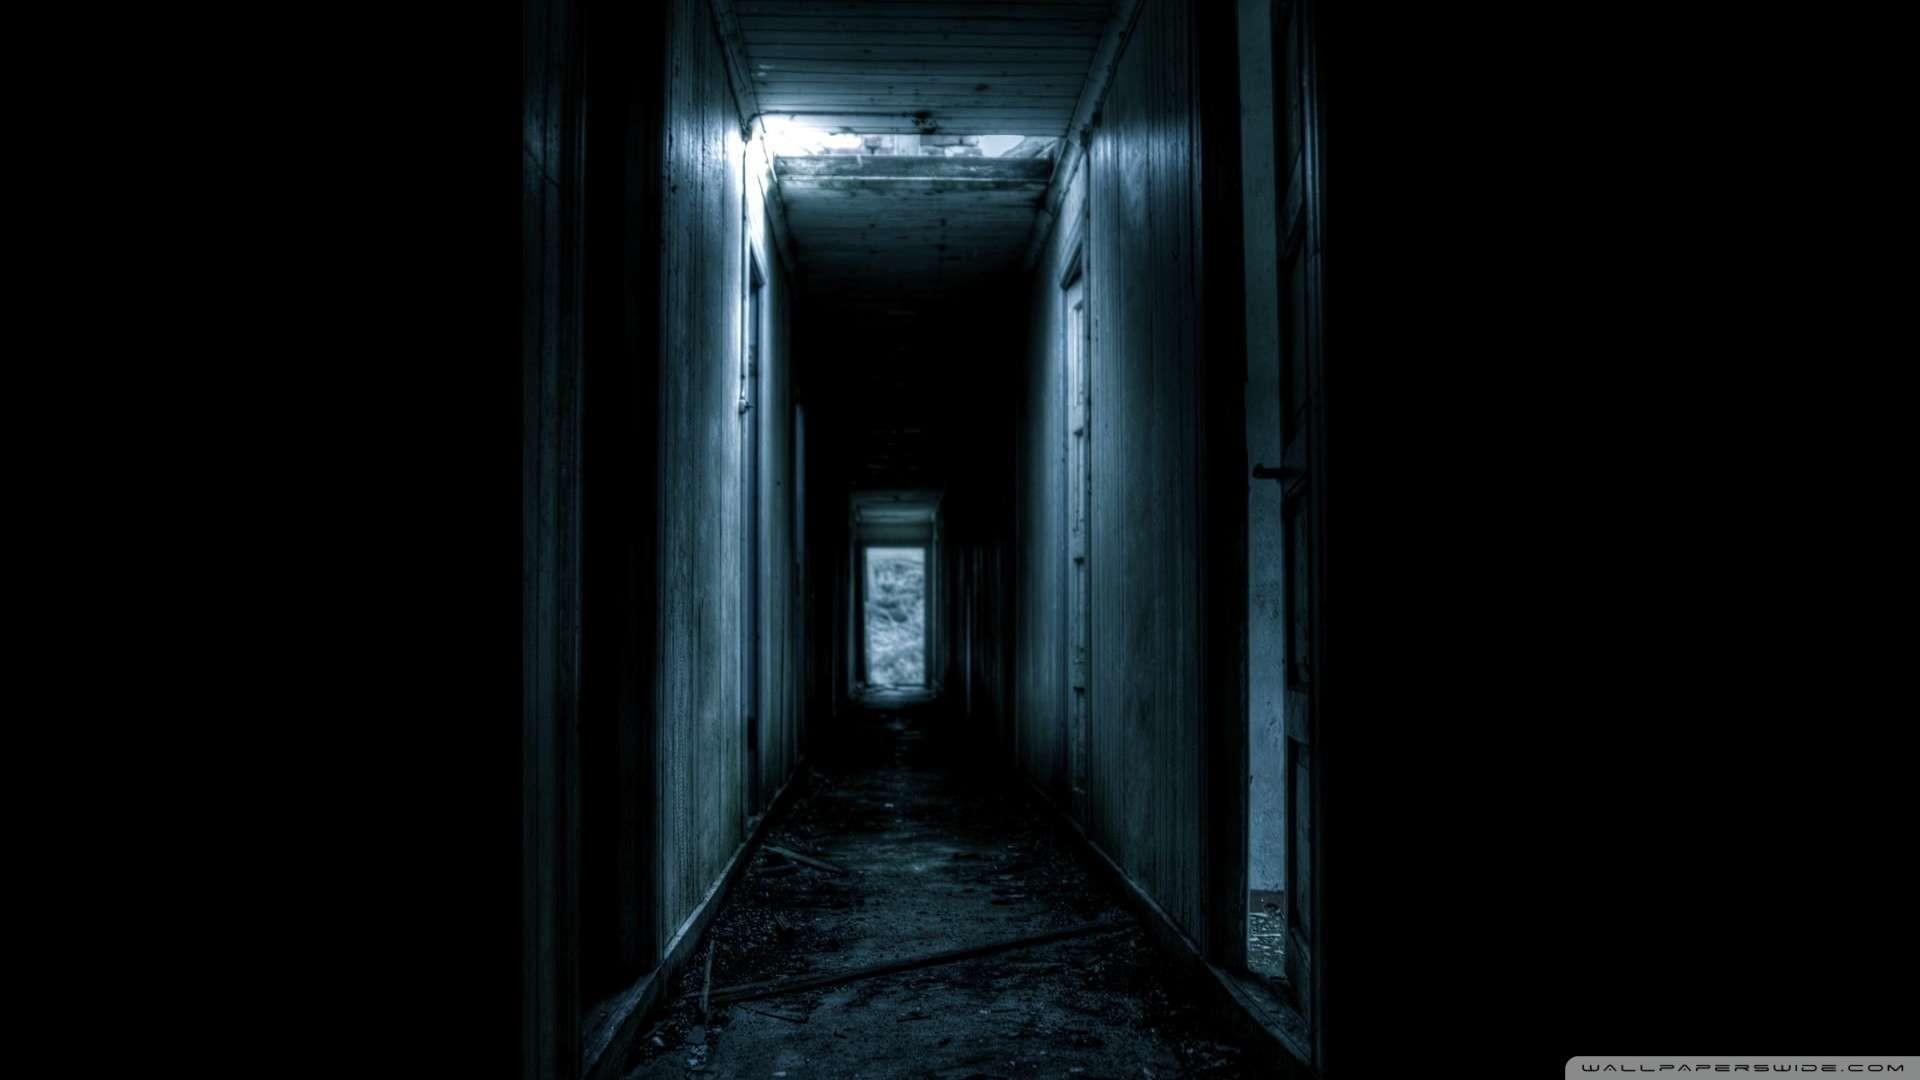 Wallpaper: Scary Corridor Wallpaper 1080p HD. Upload at February 13 .